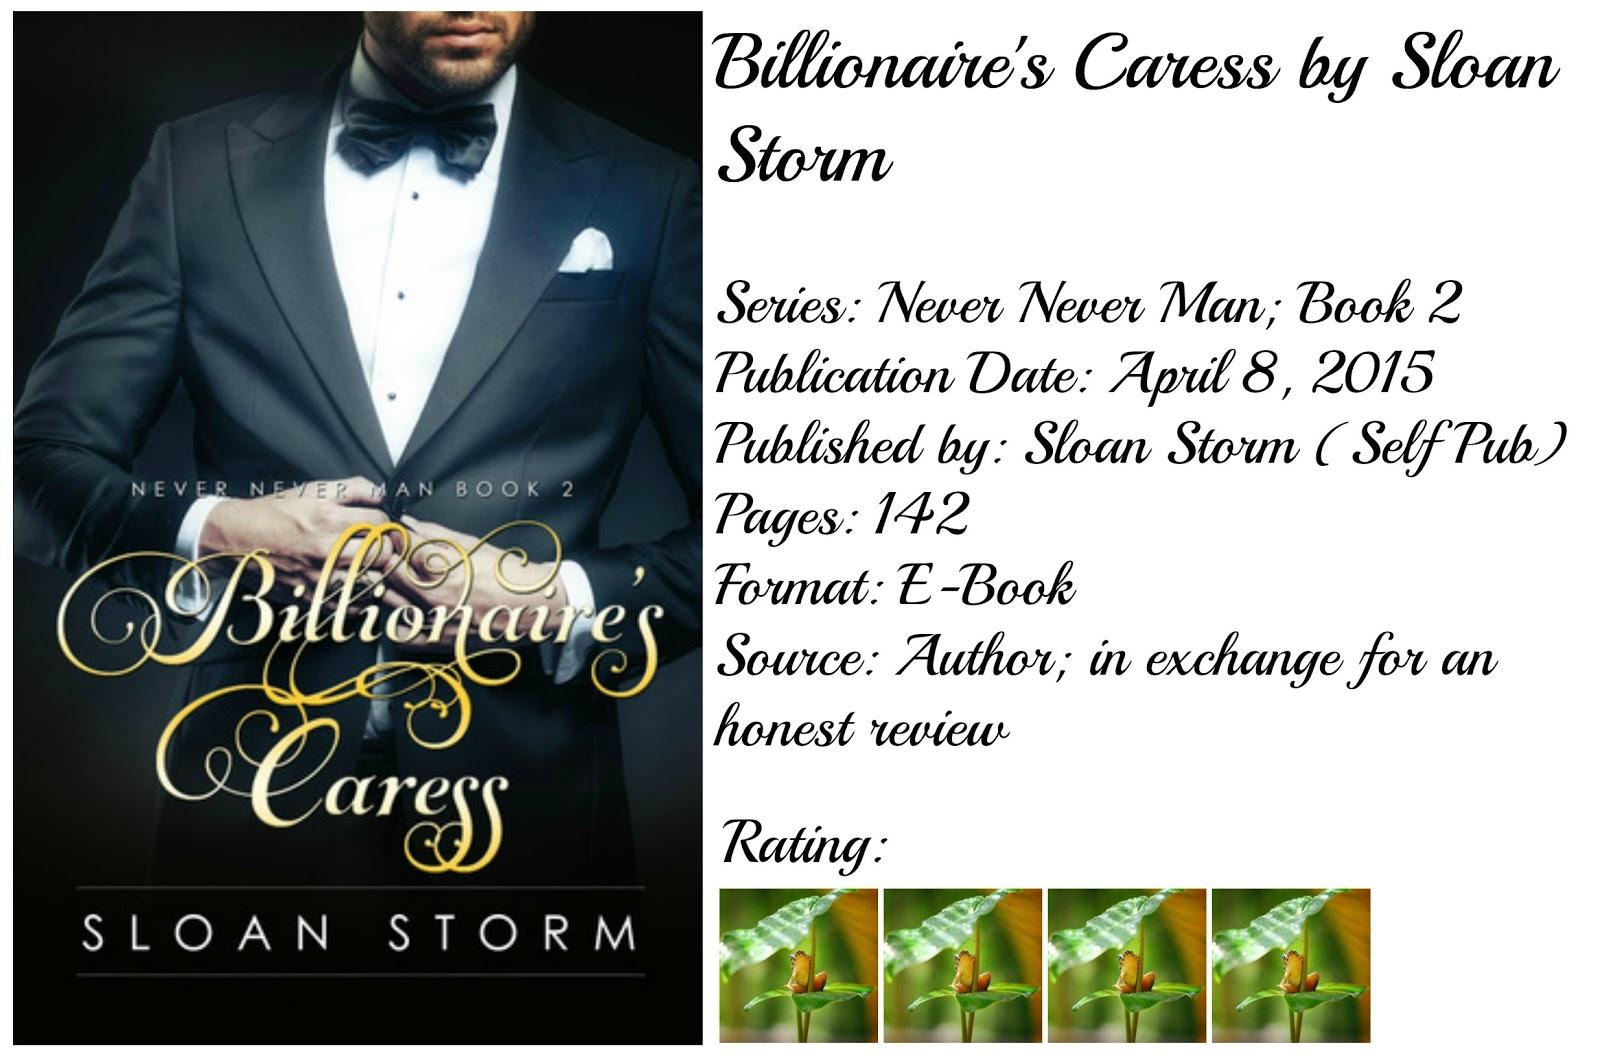 billionaires caress.jpg